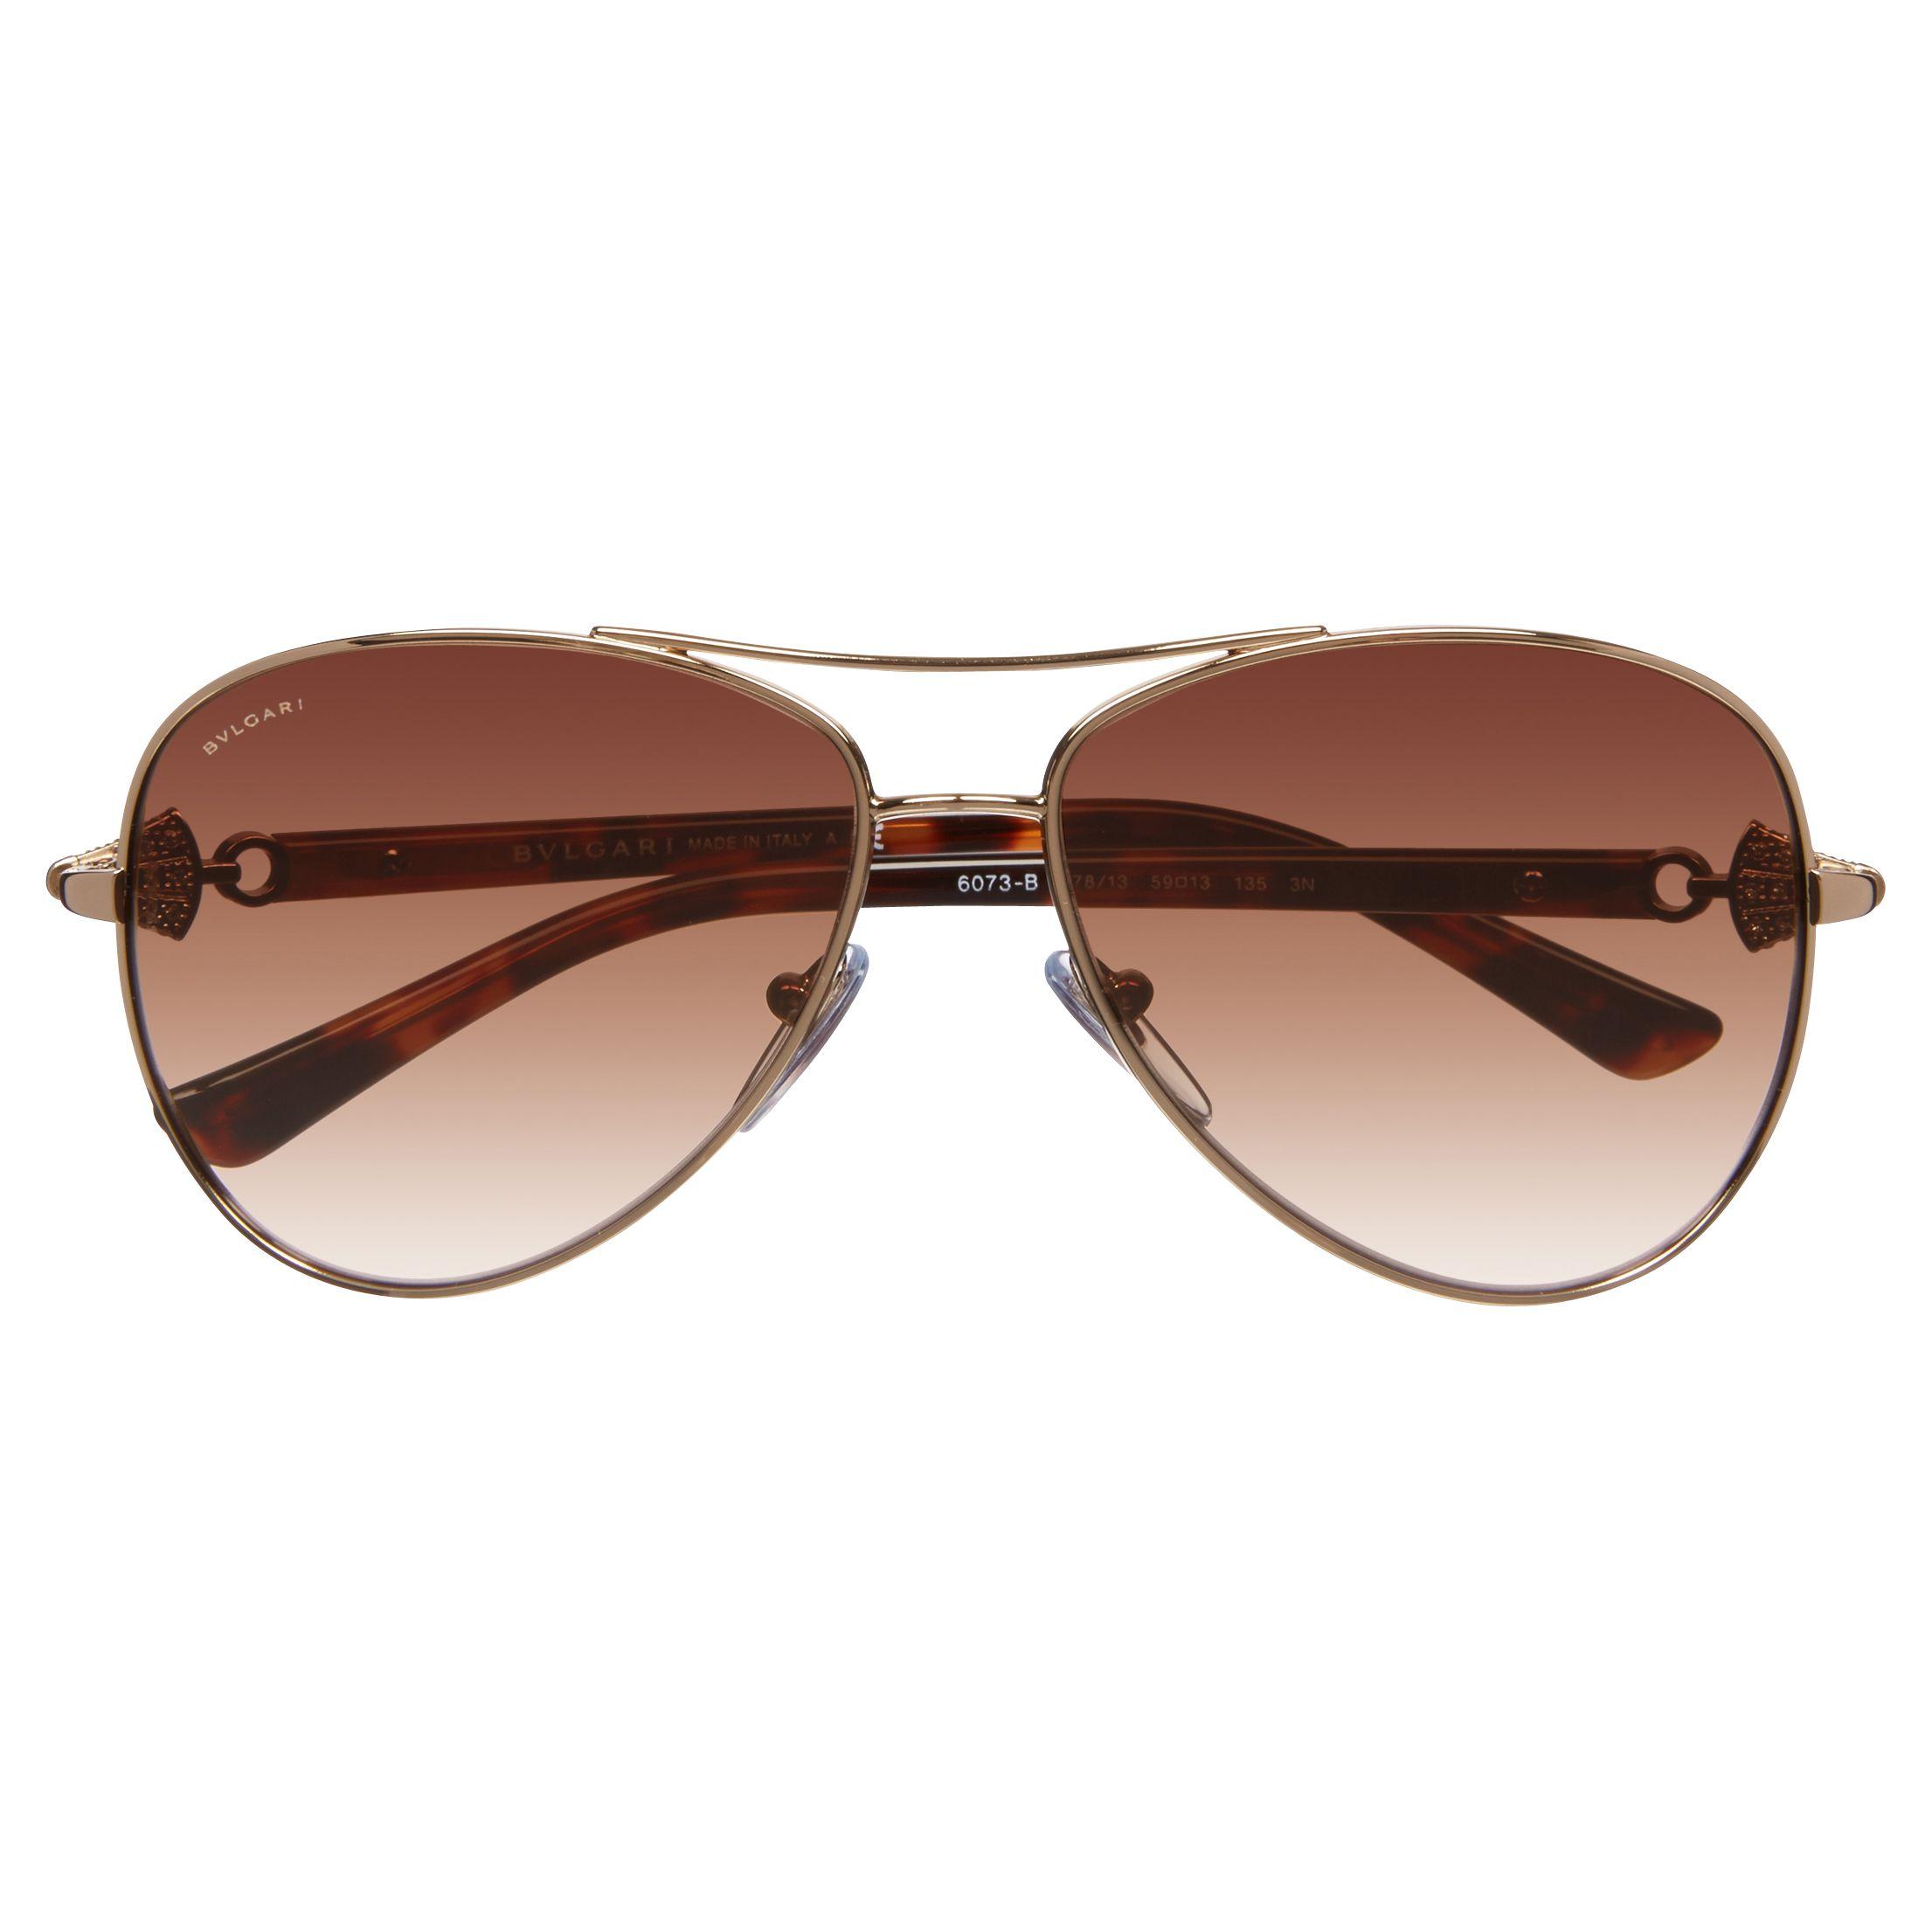 Bvlgari Sunglasses Gold Frame : Buy Bvlgari BV6073B Aviator Frame Sunglasses, Gold John ...